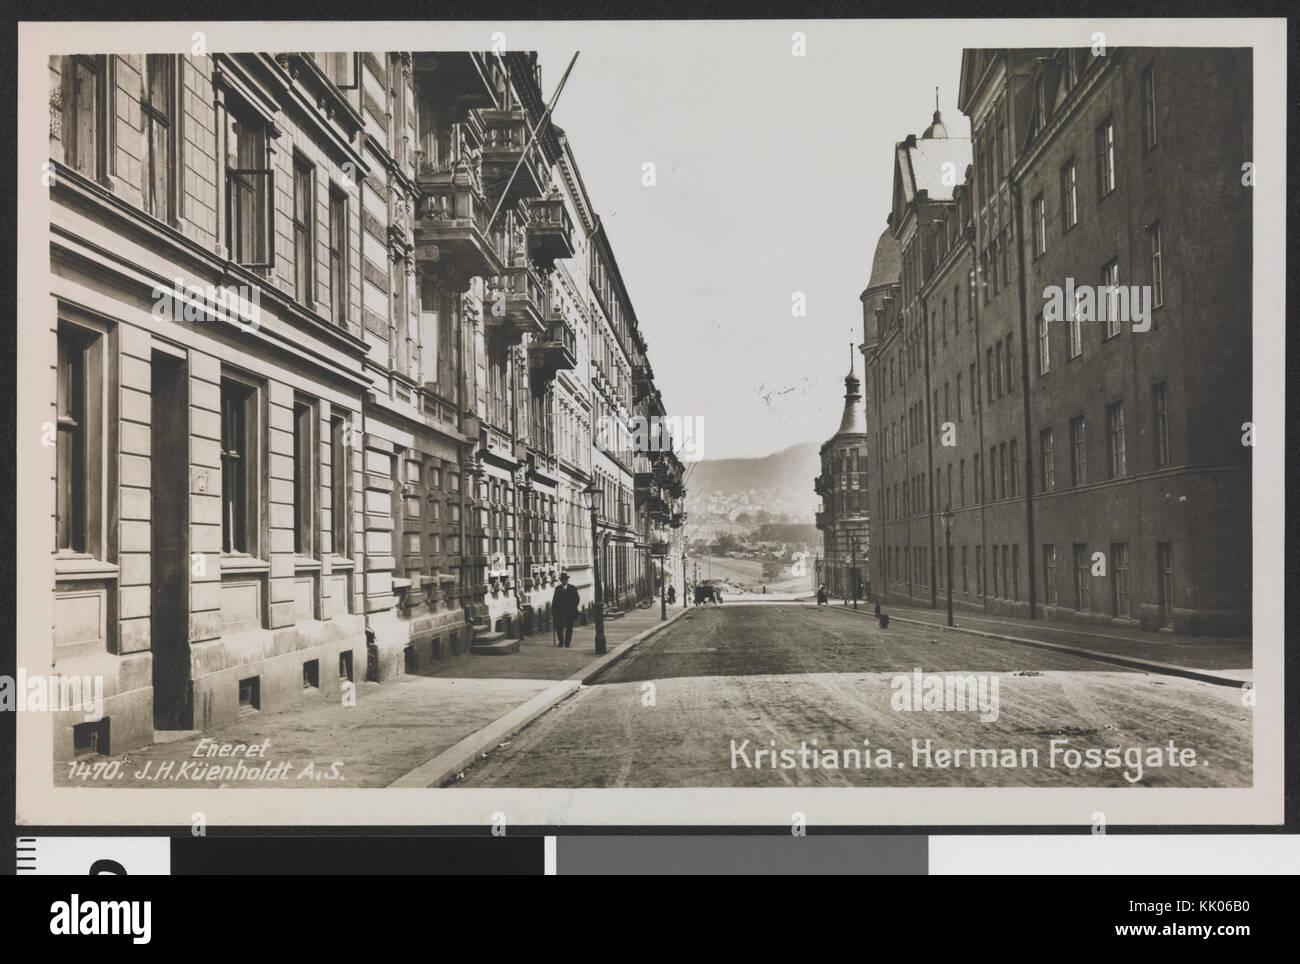 1470 Kristiania. Herman Fossgate   no nb digifoto 20151009 00112 bldsa PK00535 - Stock Image